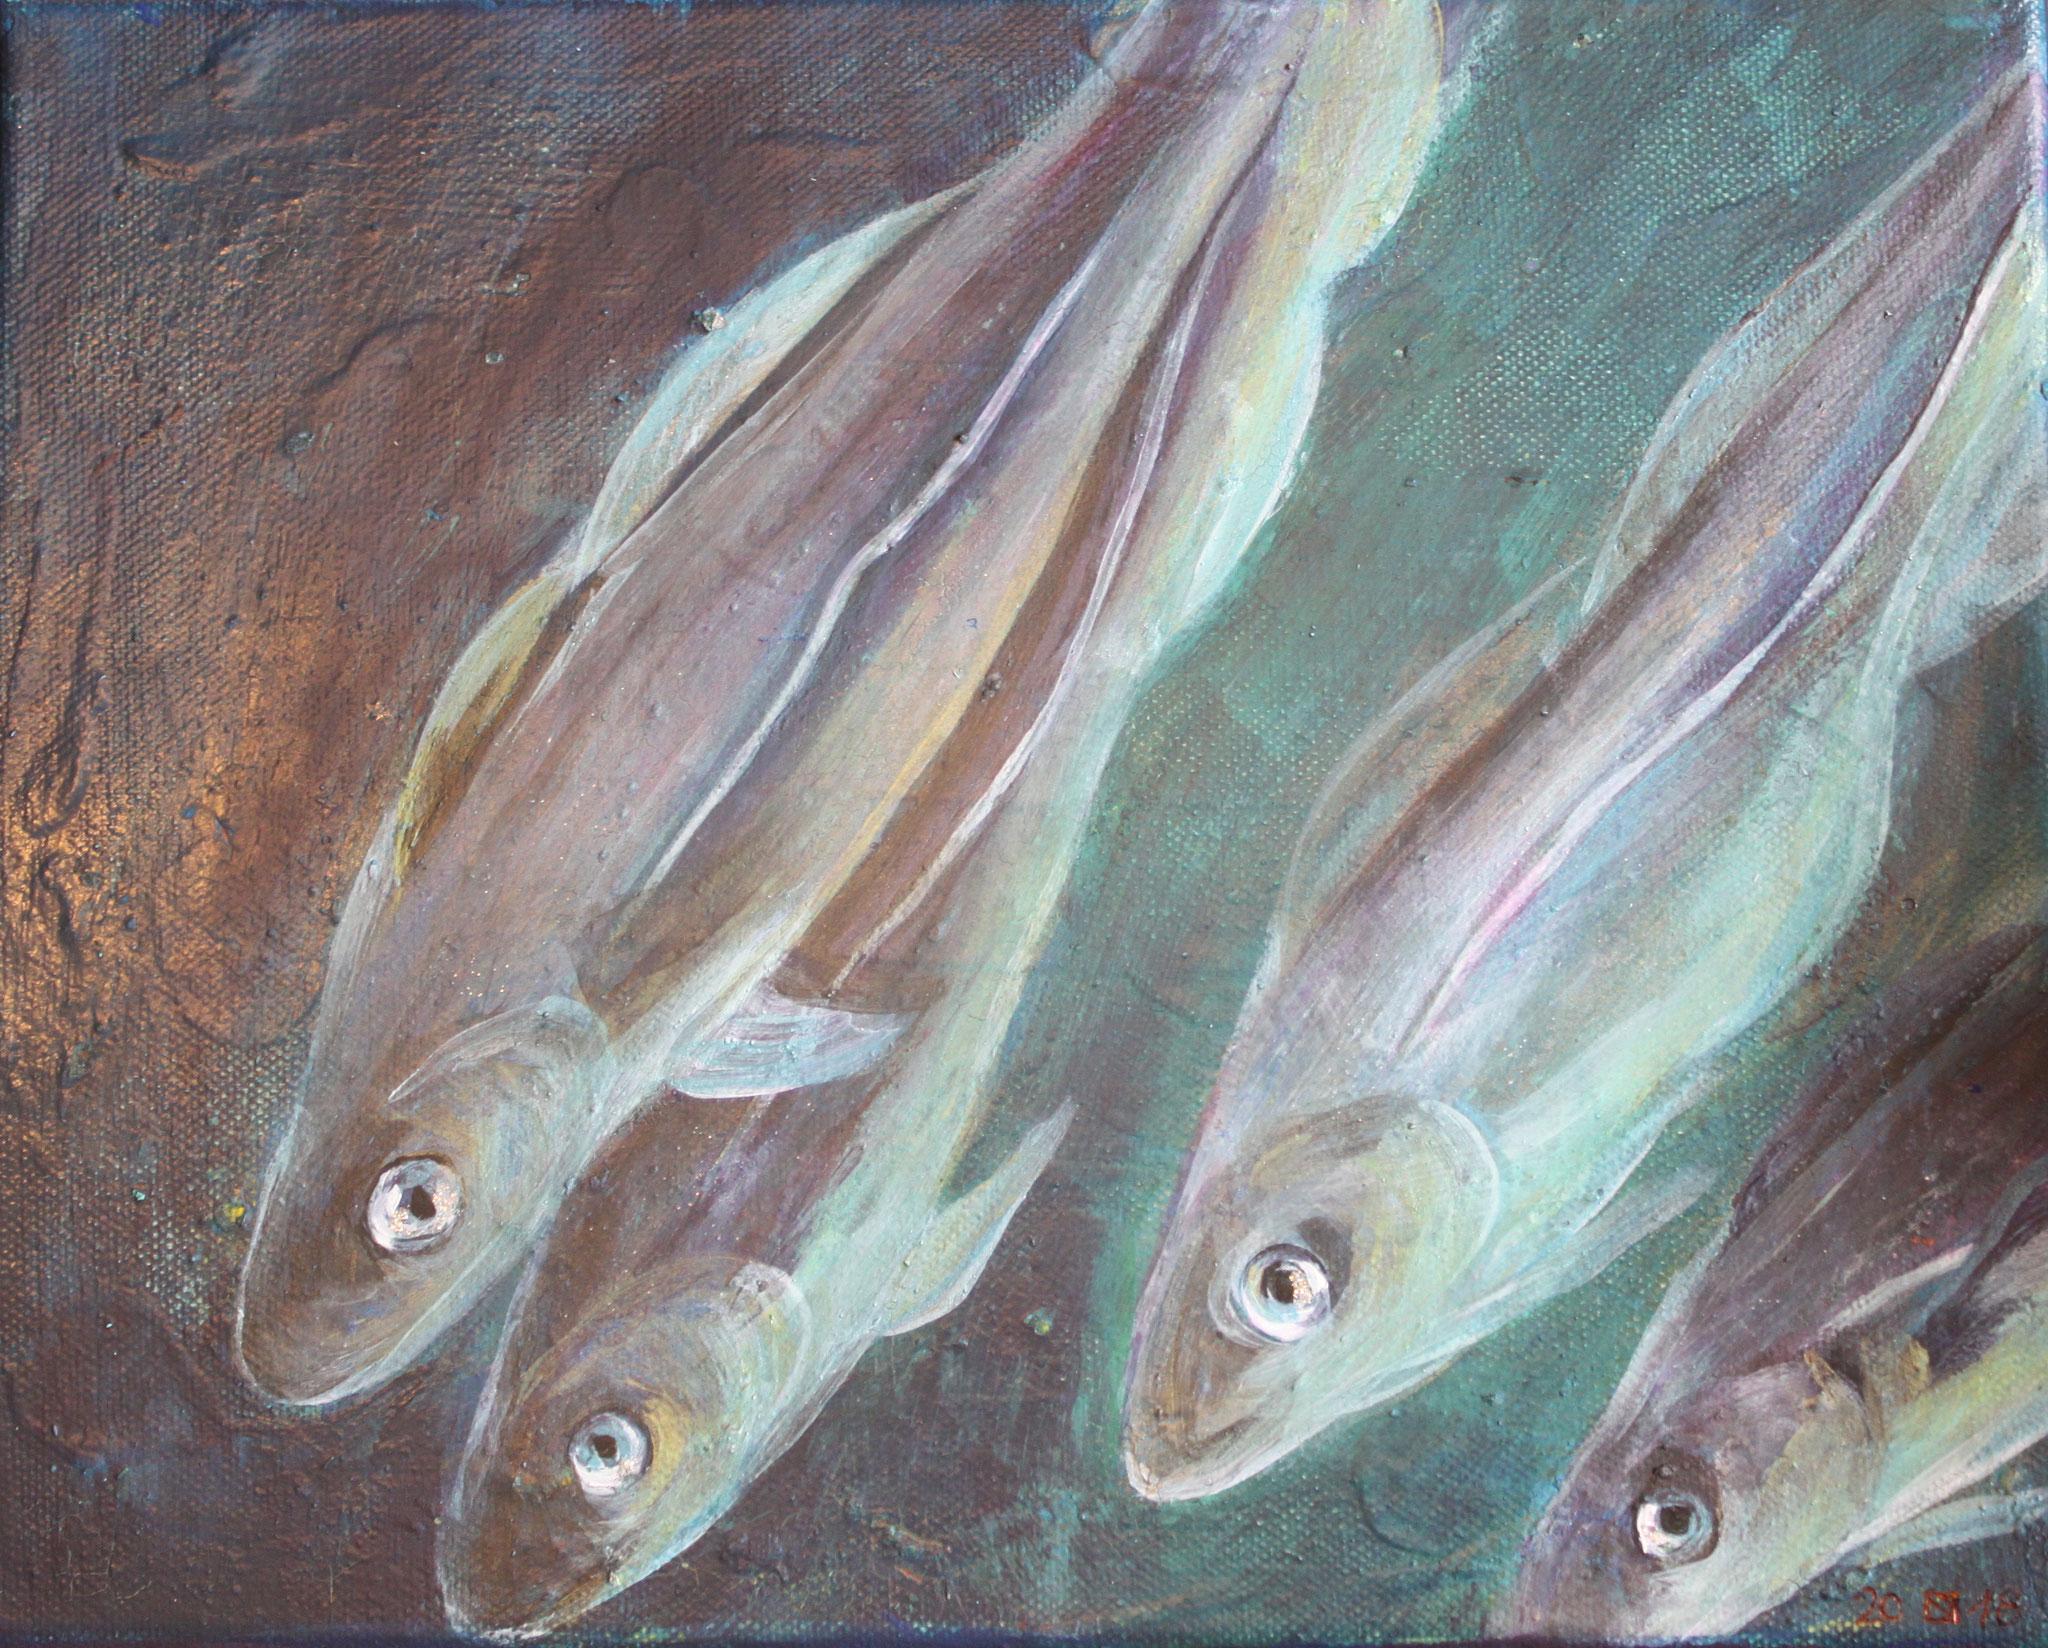 Dorsche, Acryl auf Leinwand, 2018, 25 cm x 30 cm x 1 cm